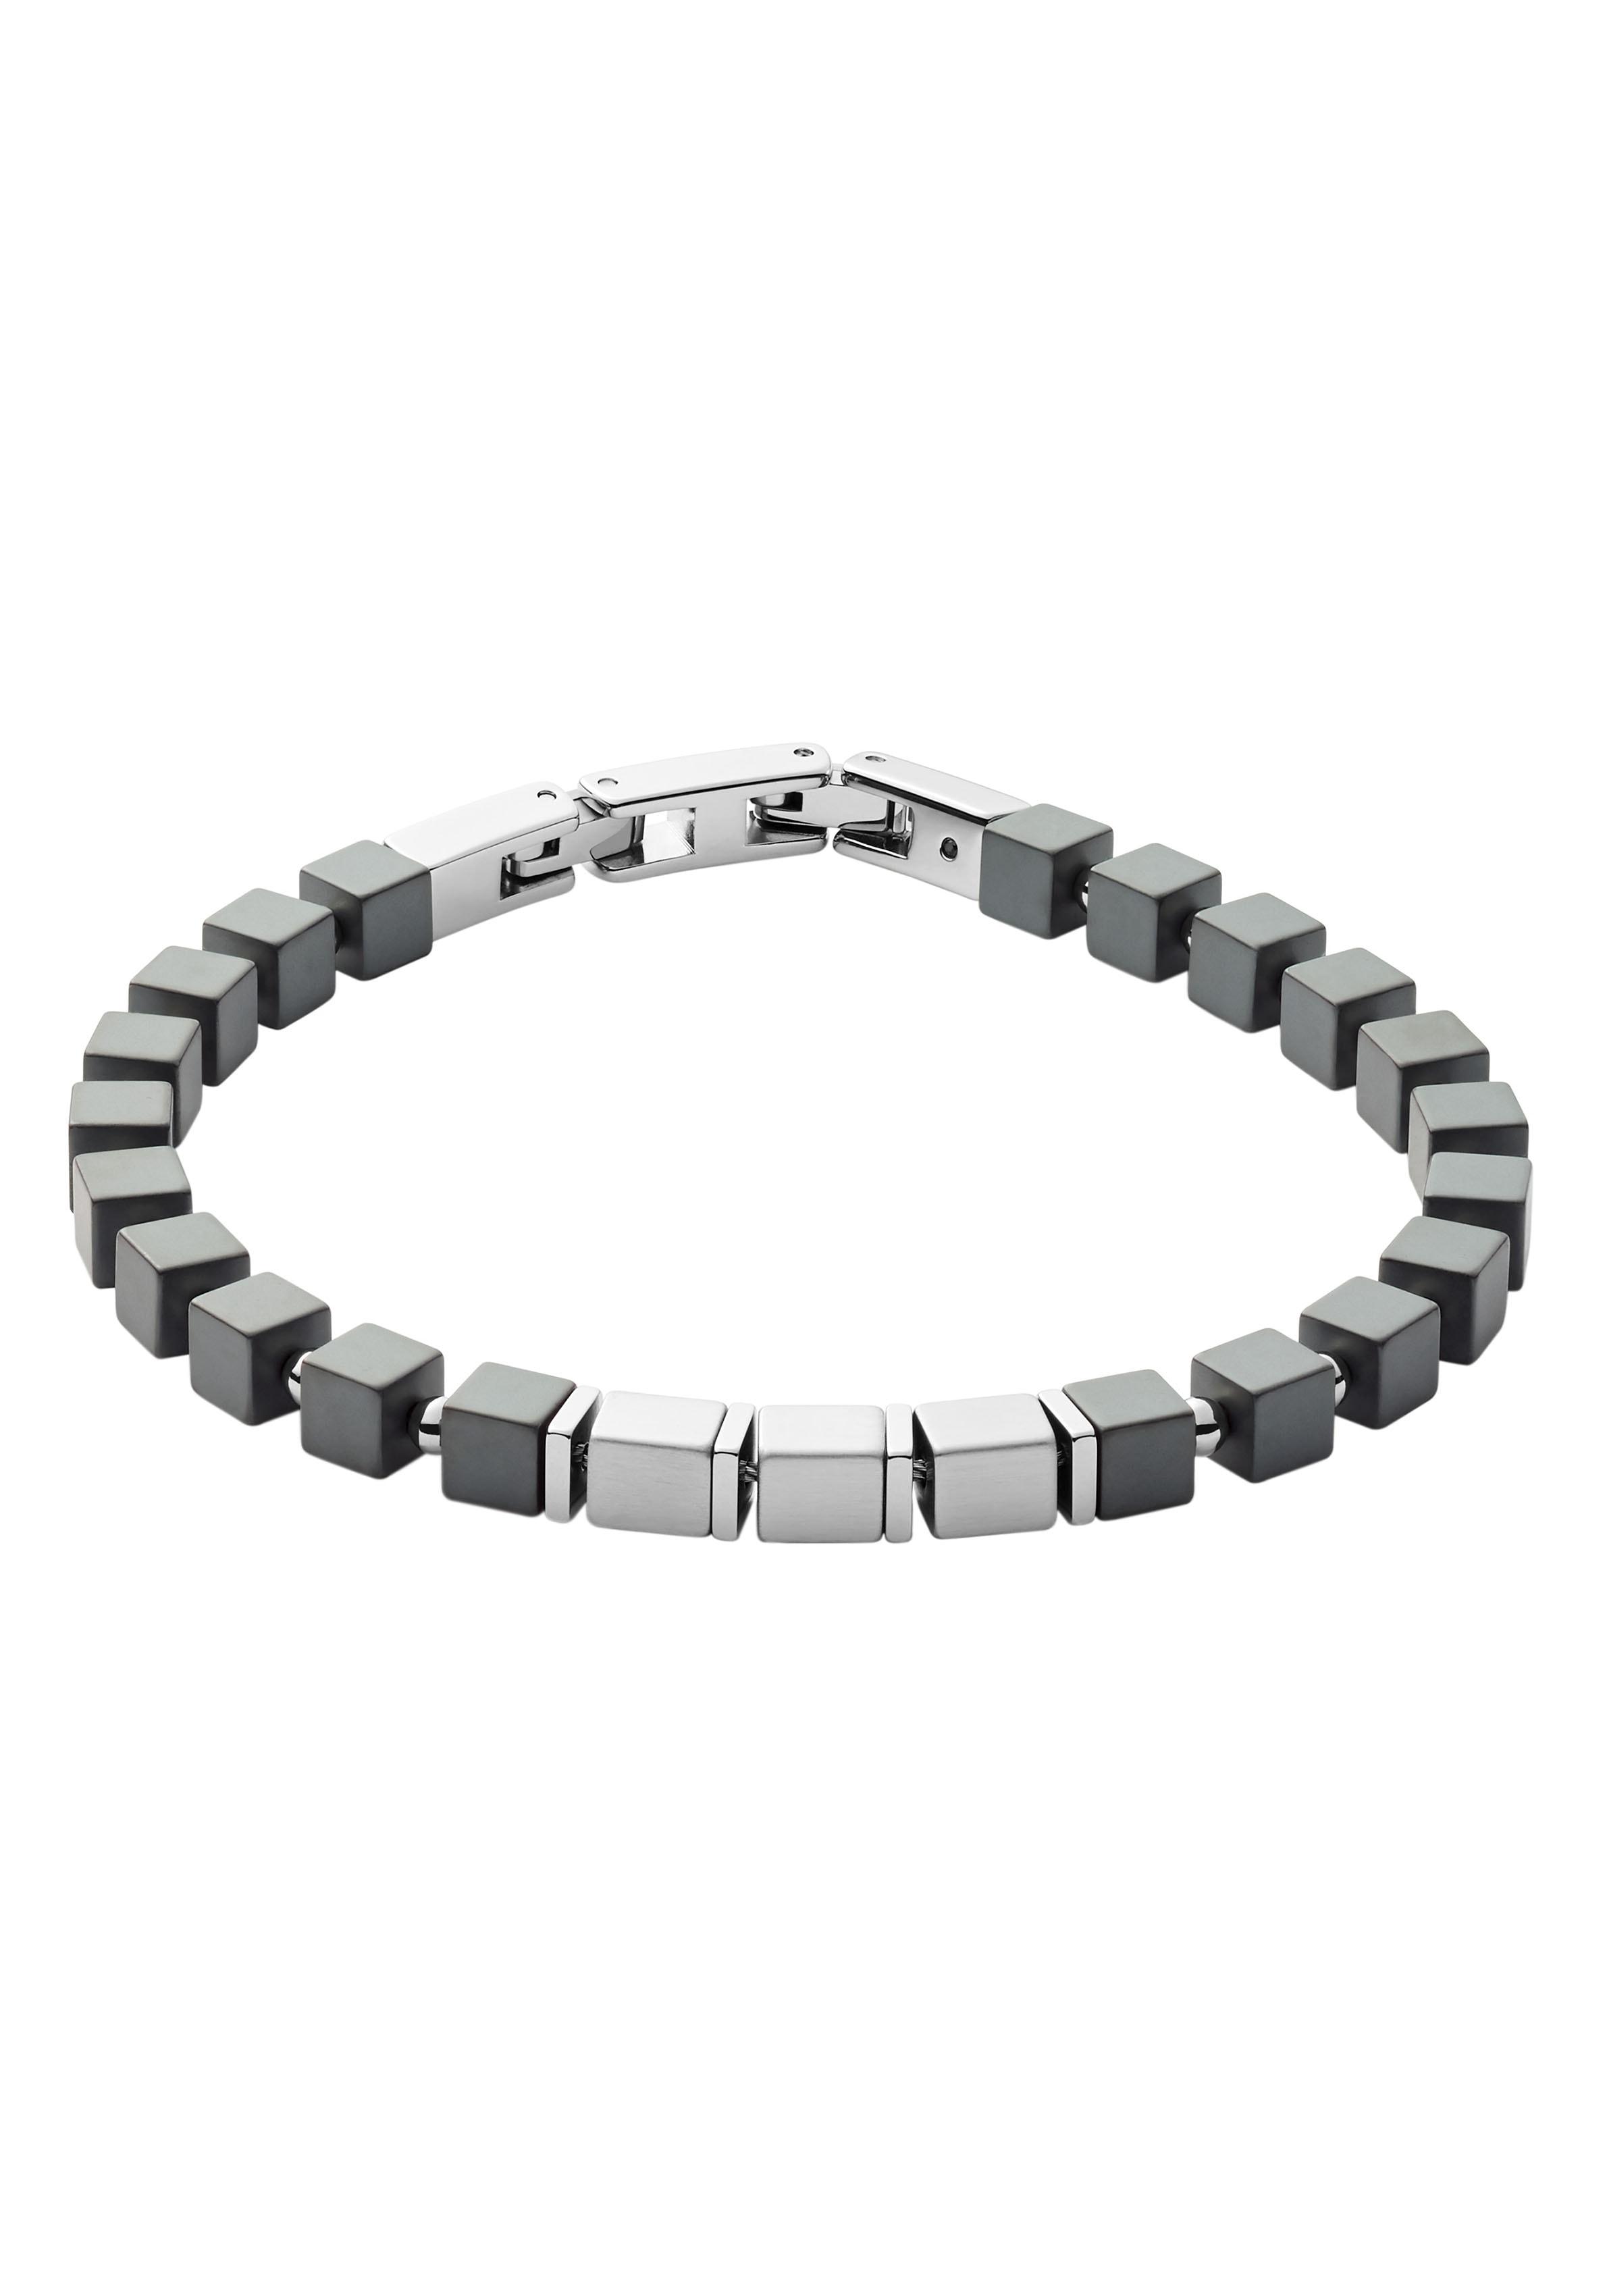 skagen -  Armband MIKAEL, SKJM0177040, Hämatit